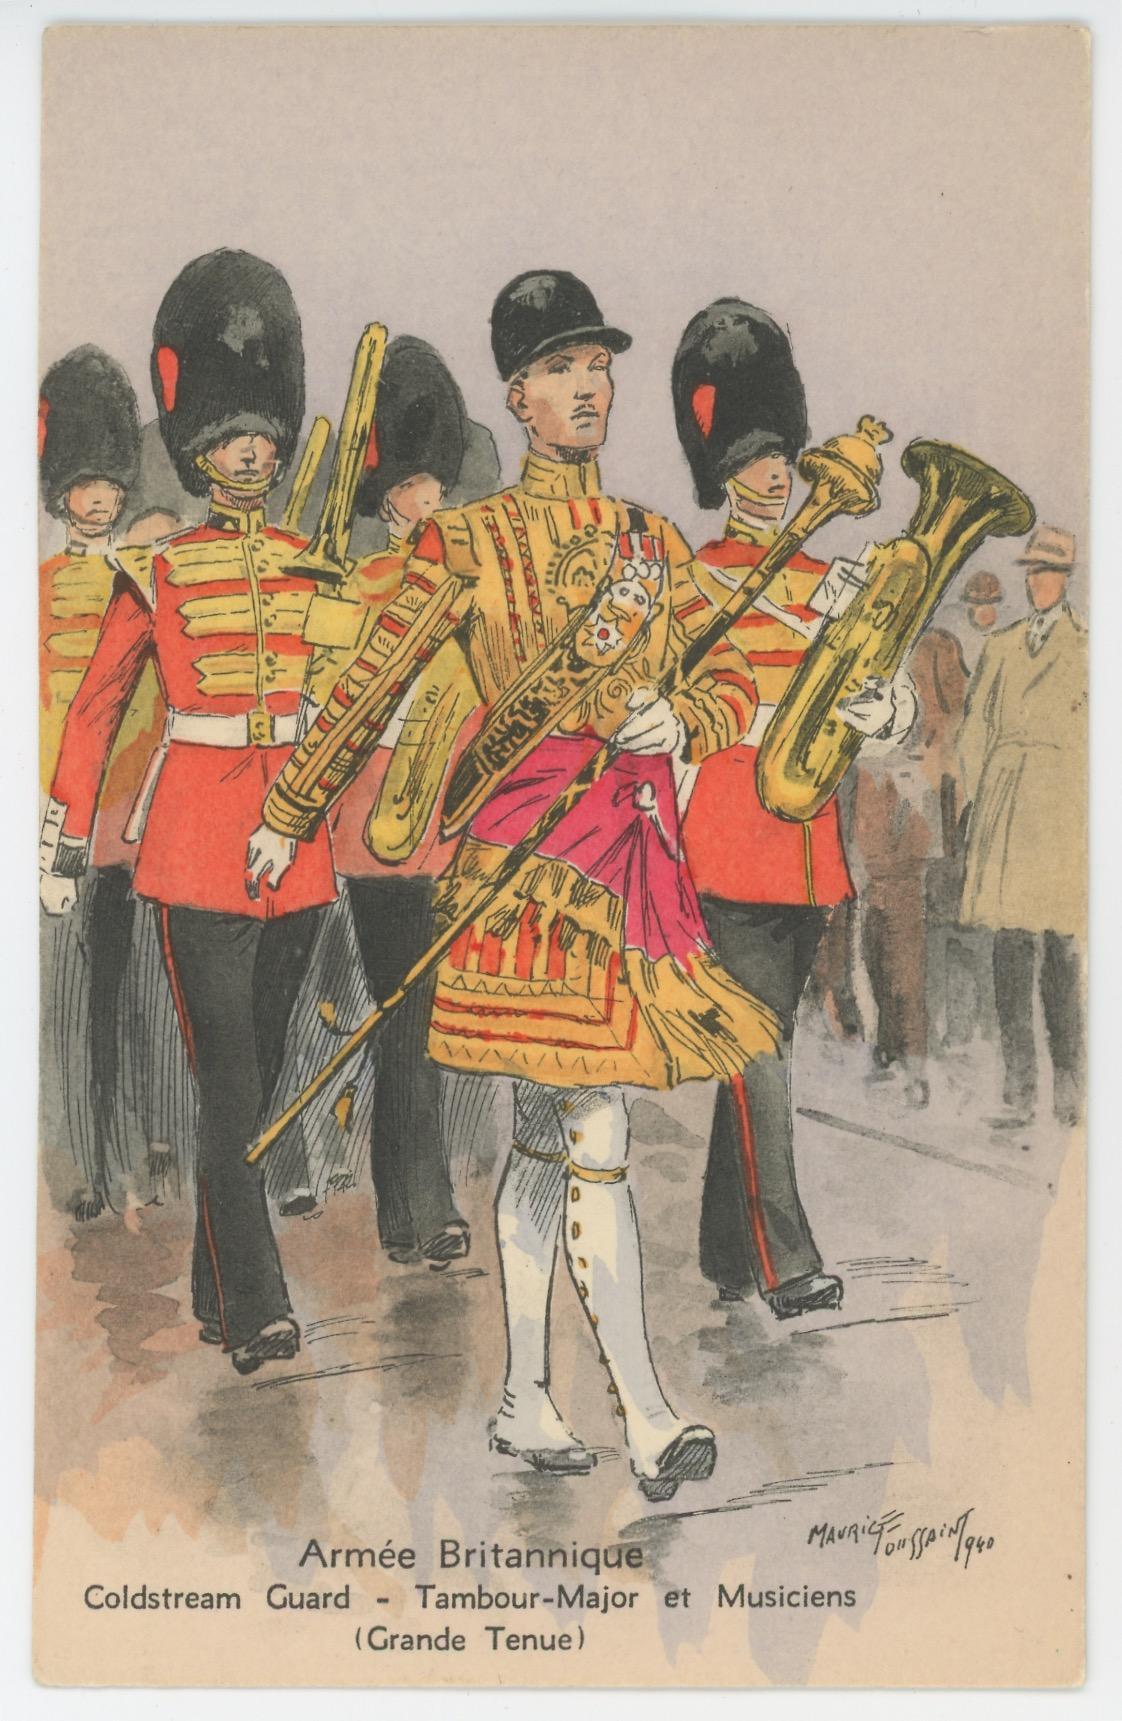 Armée Anglaise Coldstream Guard - 1939 - Maurice Toussaint - Tambour Major